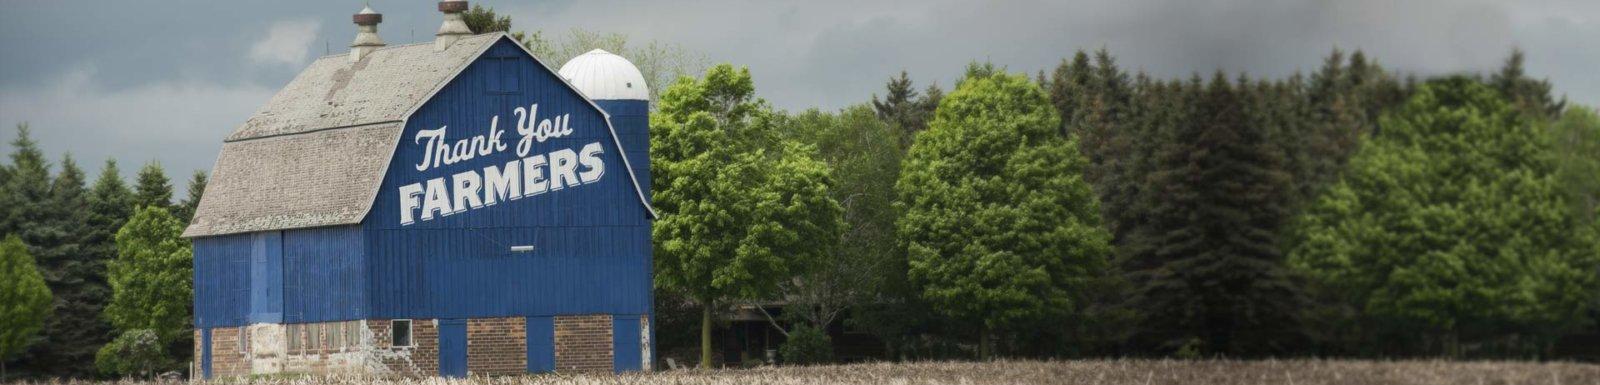 Iowa-farmland-for-sale